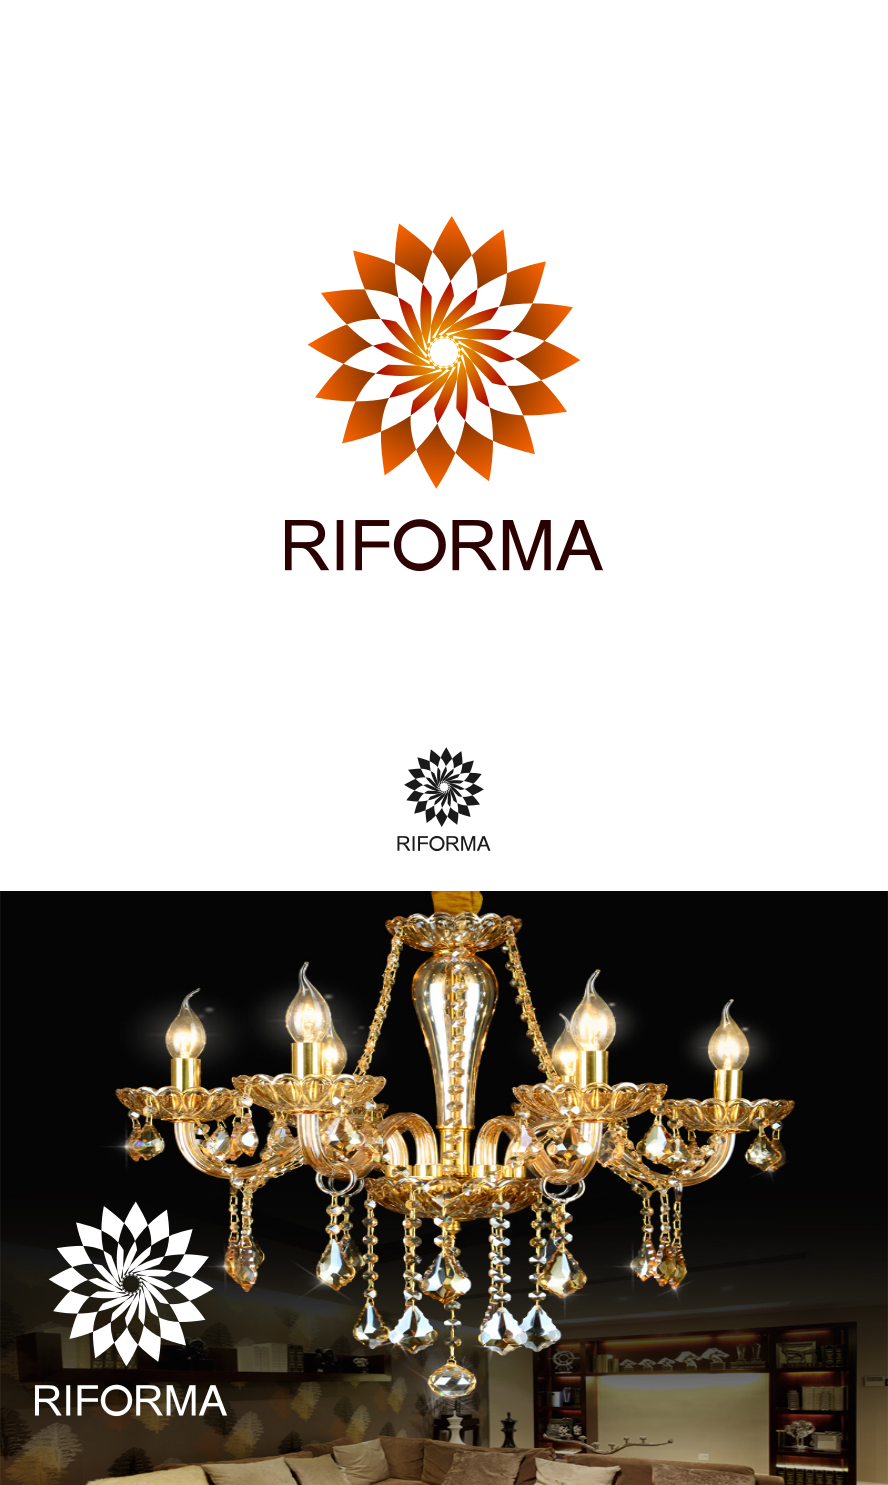 Разработка логотипа и элементов фирменного стиля фото f_7195791fcfec5716.png